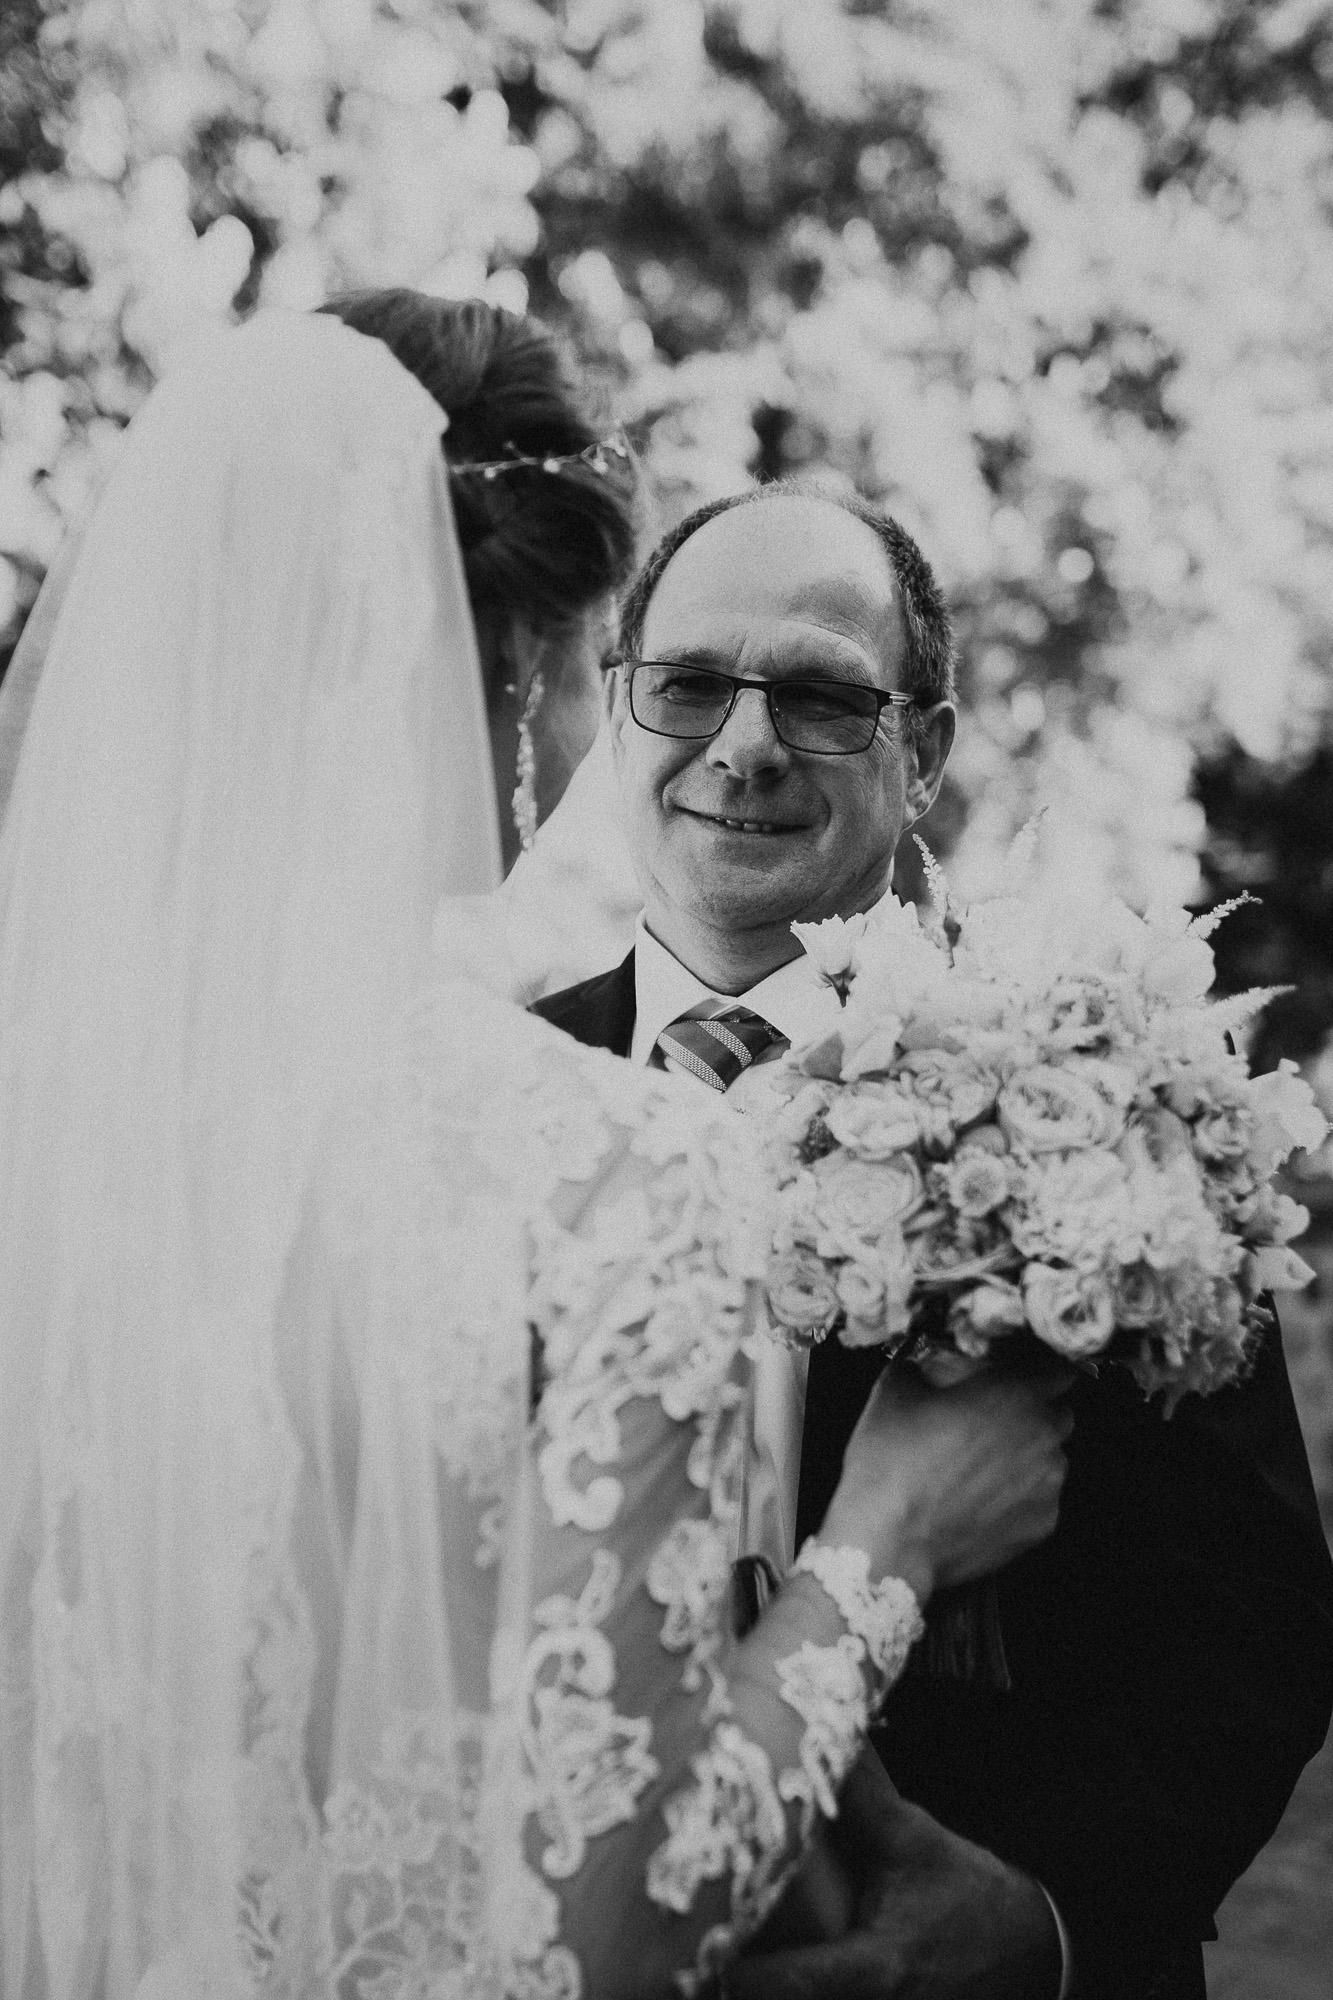 DanielaMarquardtPhotography_Hochzeitsfotograf_Düsseldorf_Köln_Mallorca_Bayern_Austria_Harz_Wedding_AileenundLennart_Weddingphotographer_Ibiza_Tuskany_Italien_Toskana_Portugal_Lissabon156